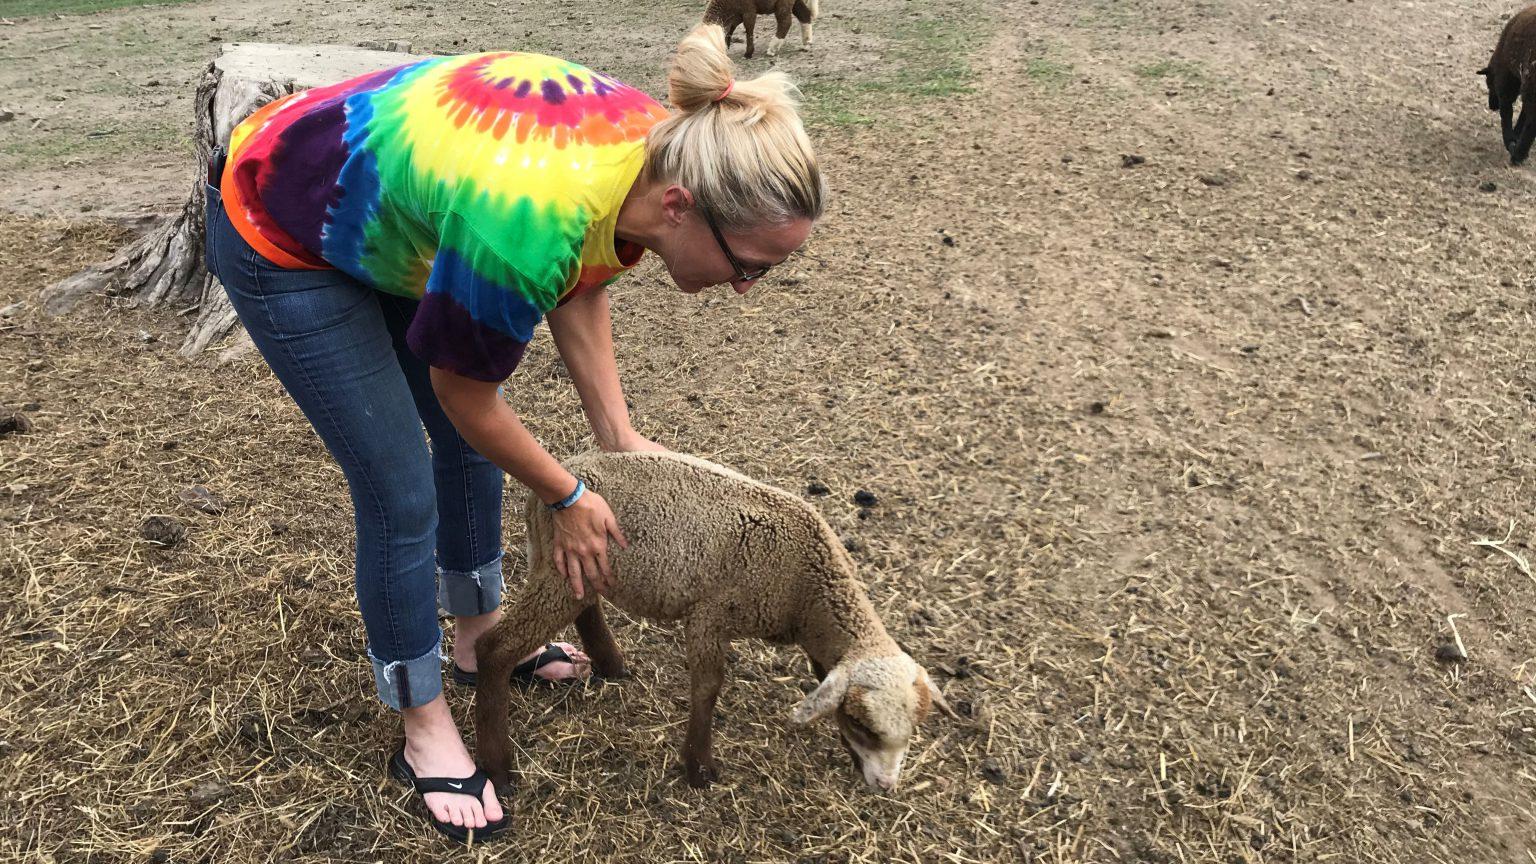 Cyndy Ash runs Jubilee Farms in Clinton, Illinois, where she raises sheep for wool.